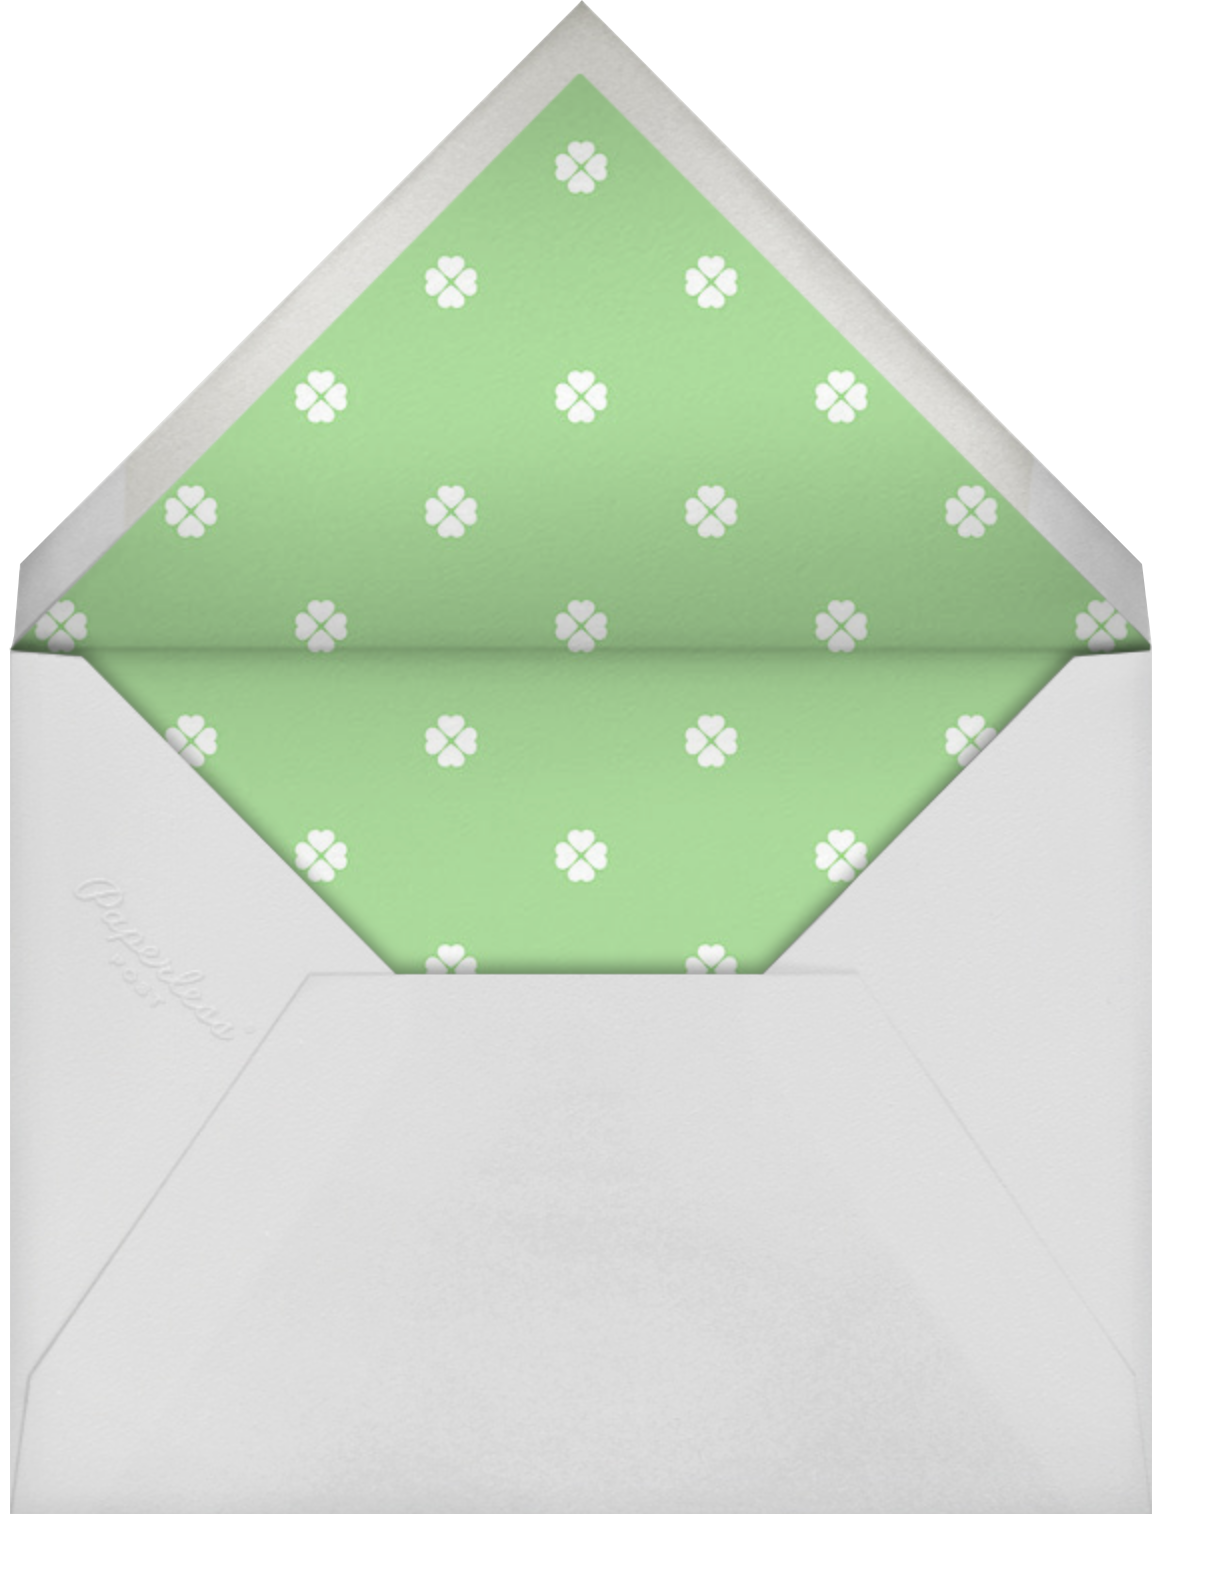 Colorblocked Stripes - Lemon Drop/Meadow - kate spade new york - Save the date - envelope back